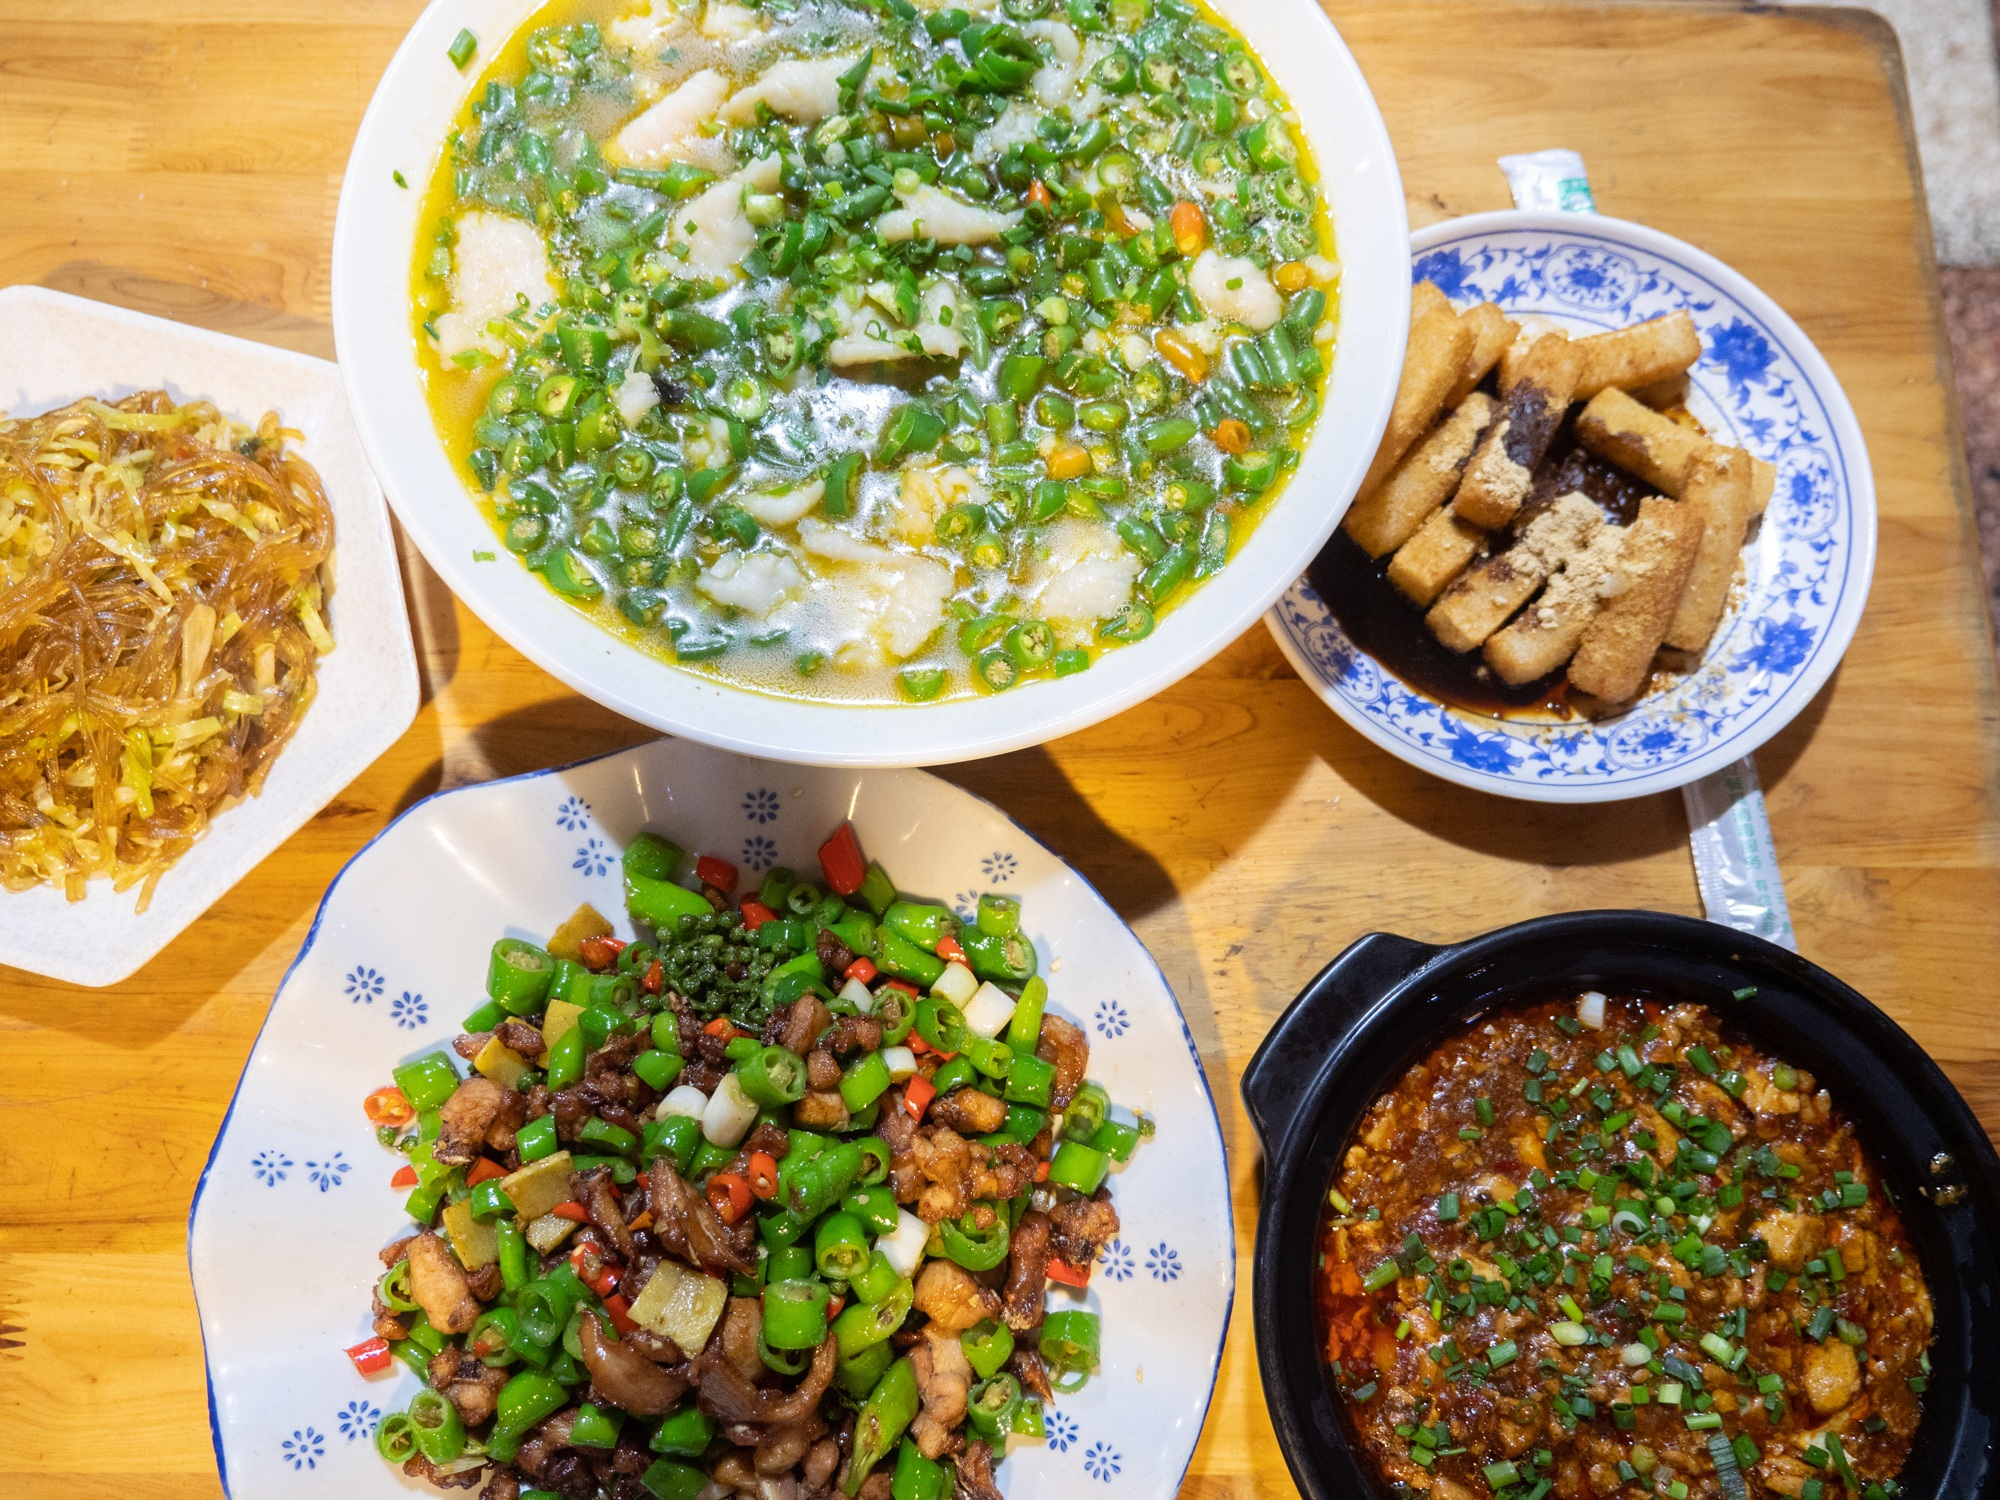 One of the original fly restaurants of chengdu